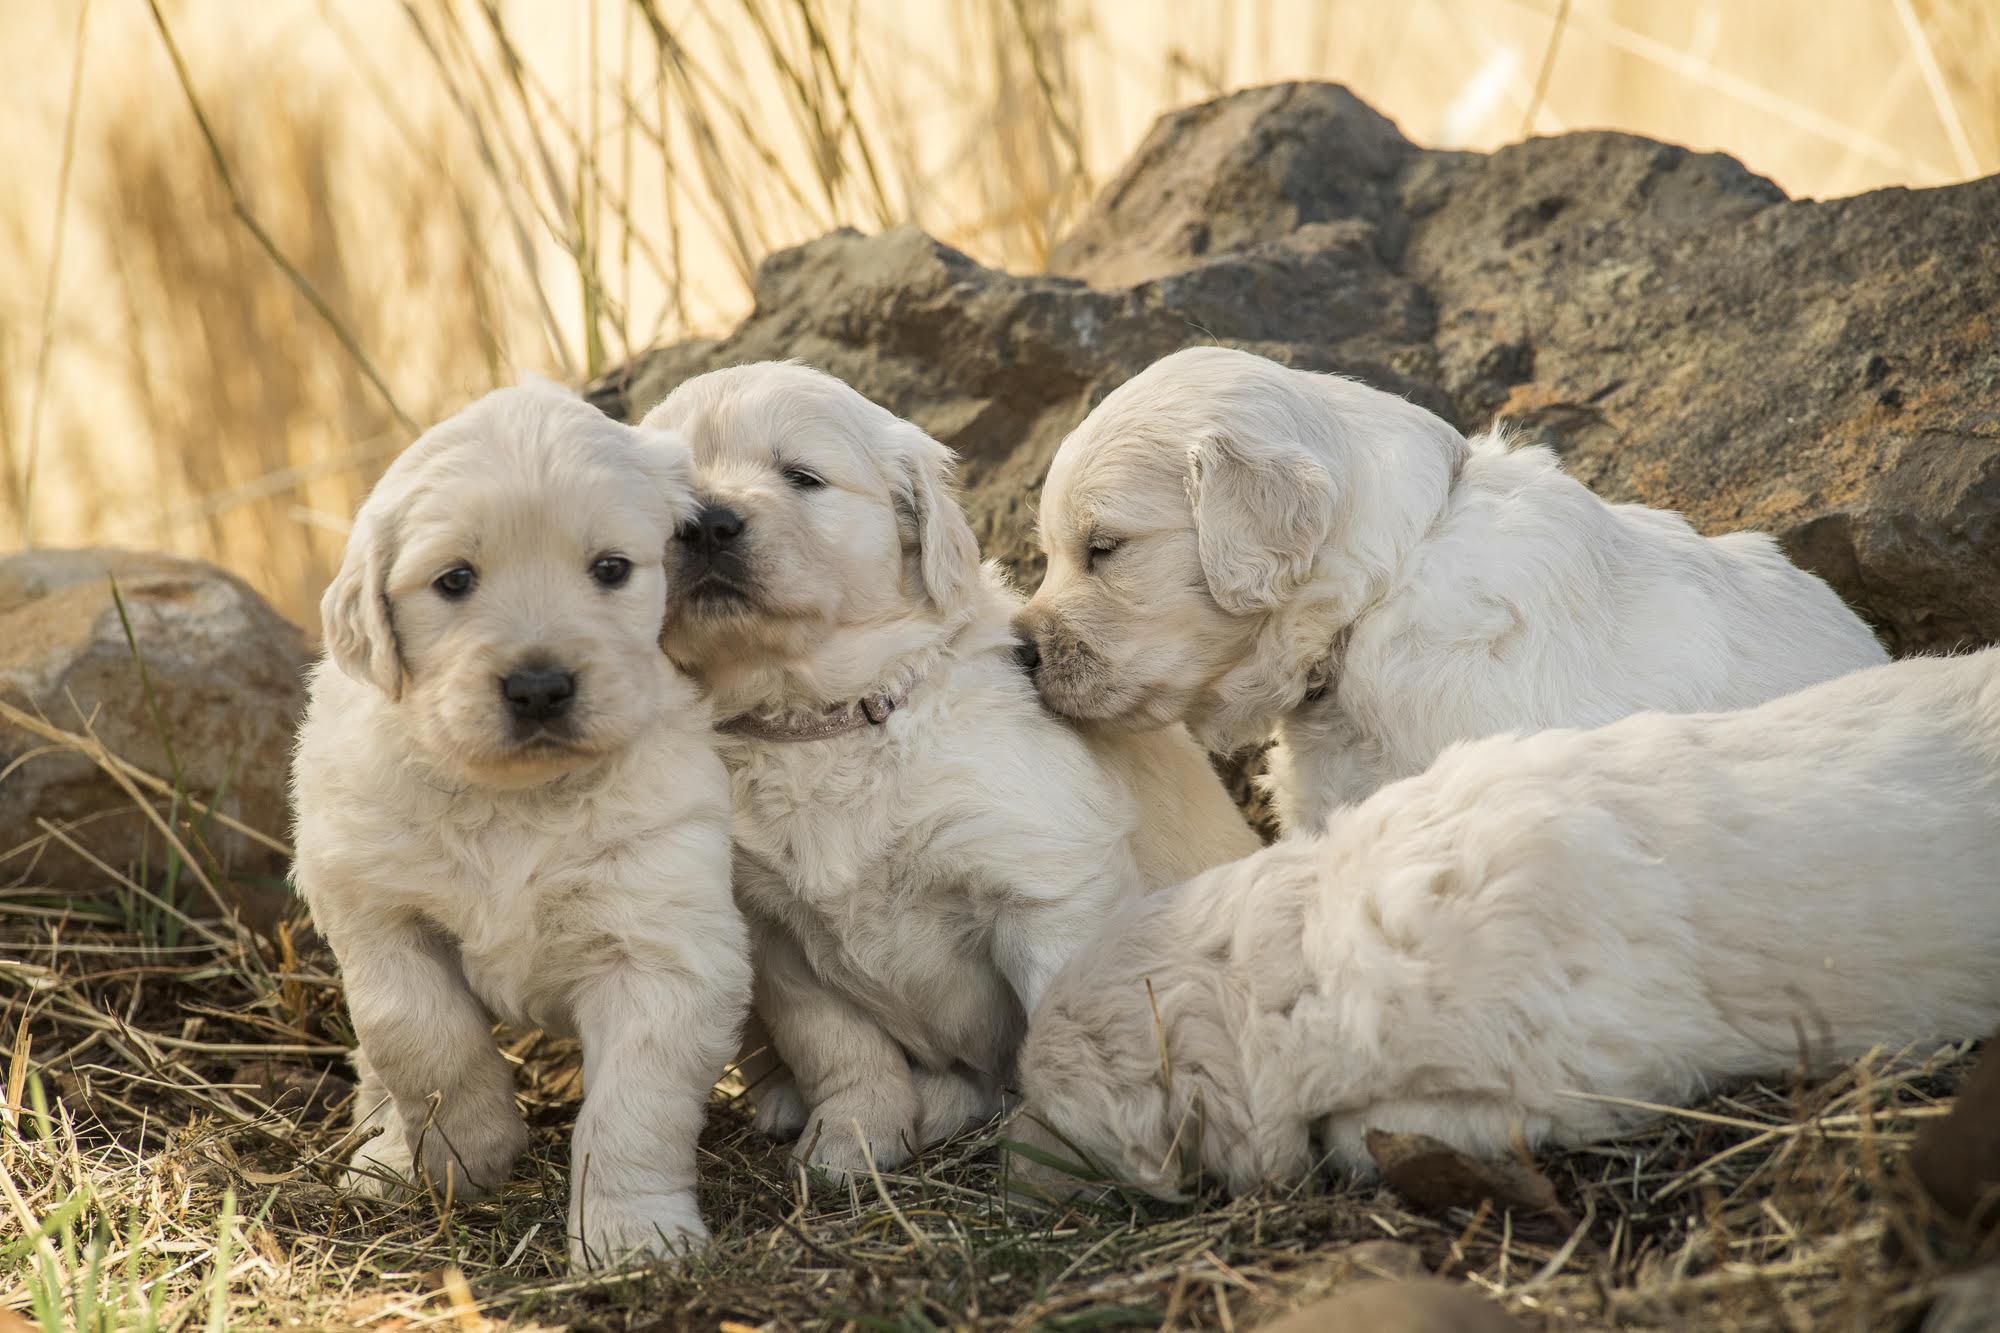 Council House Golden Retriever puppies